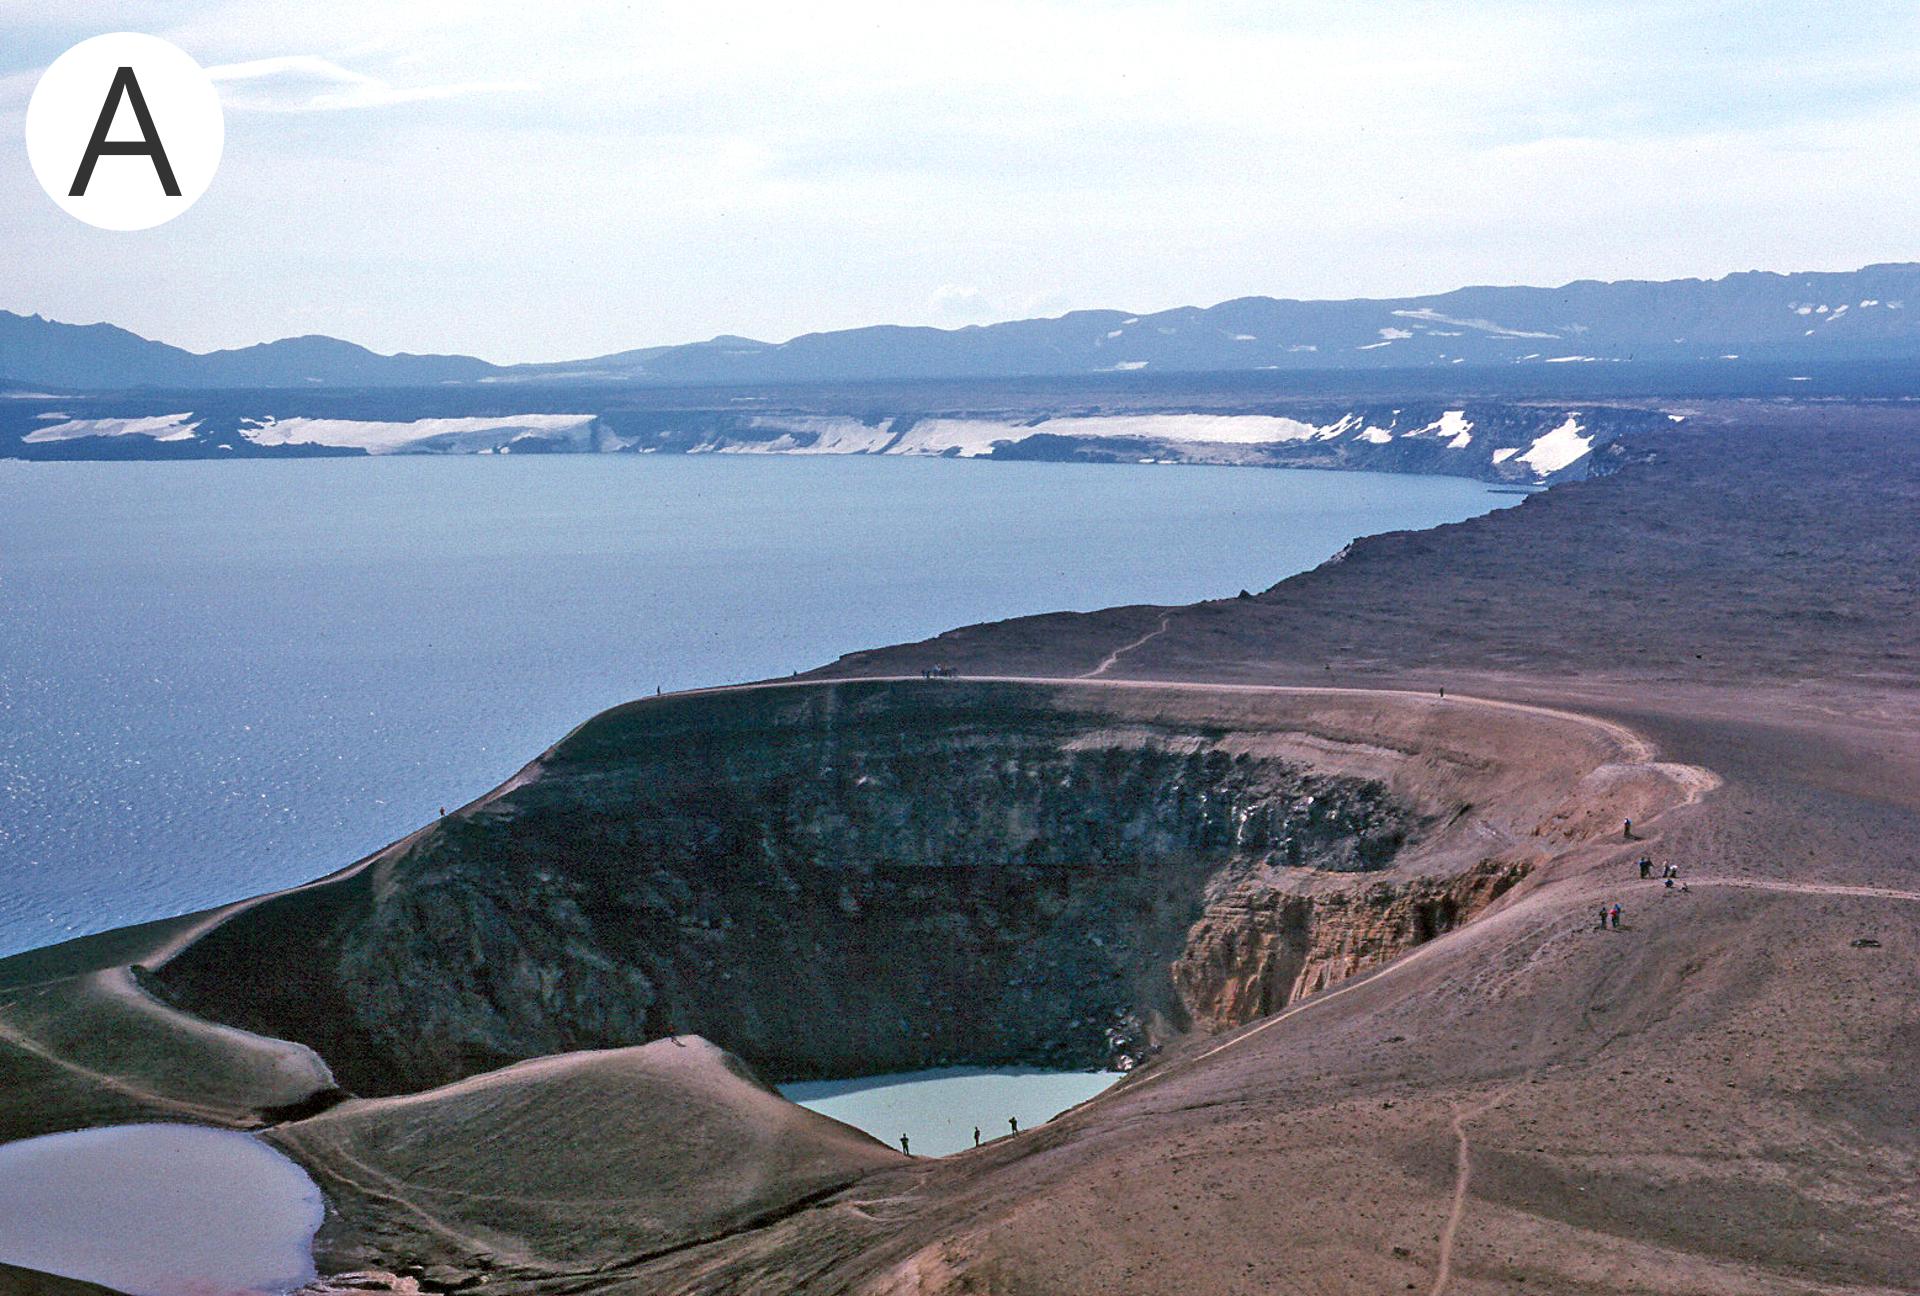 Obszary wulkaniczne na Islandii